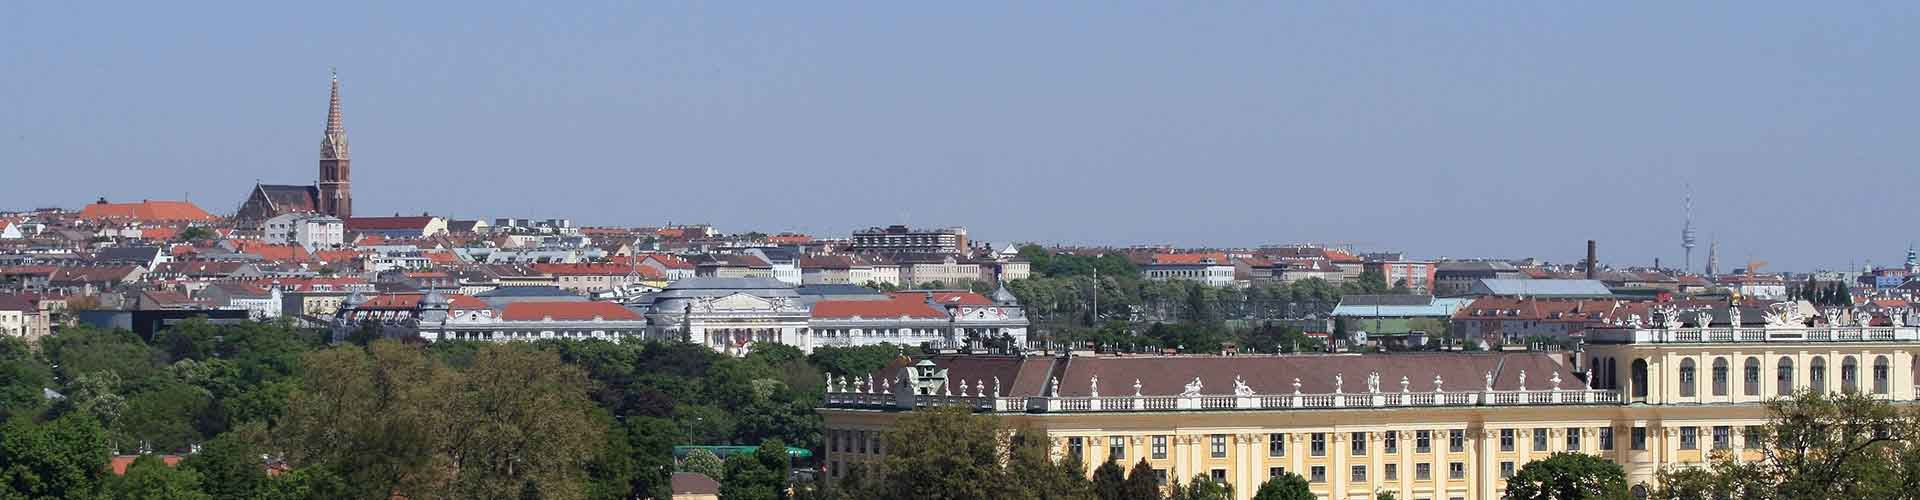 Vídeň - apartmány ve čtvrti Rudolfsheim-Fuenfhaus. Mapy pro Vídeň, fotky a recenze pro každý apartmán - Vídeň.